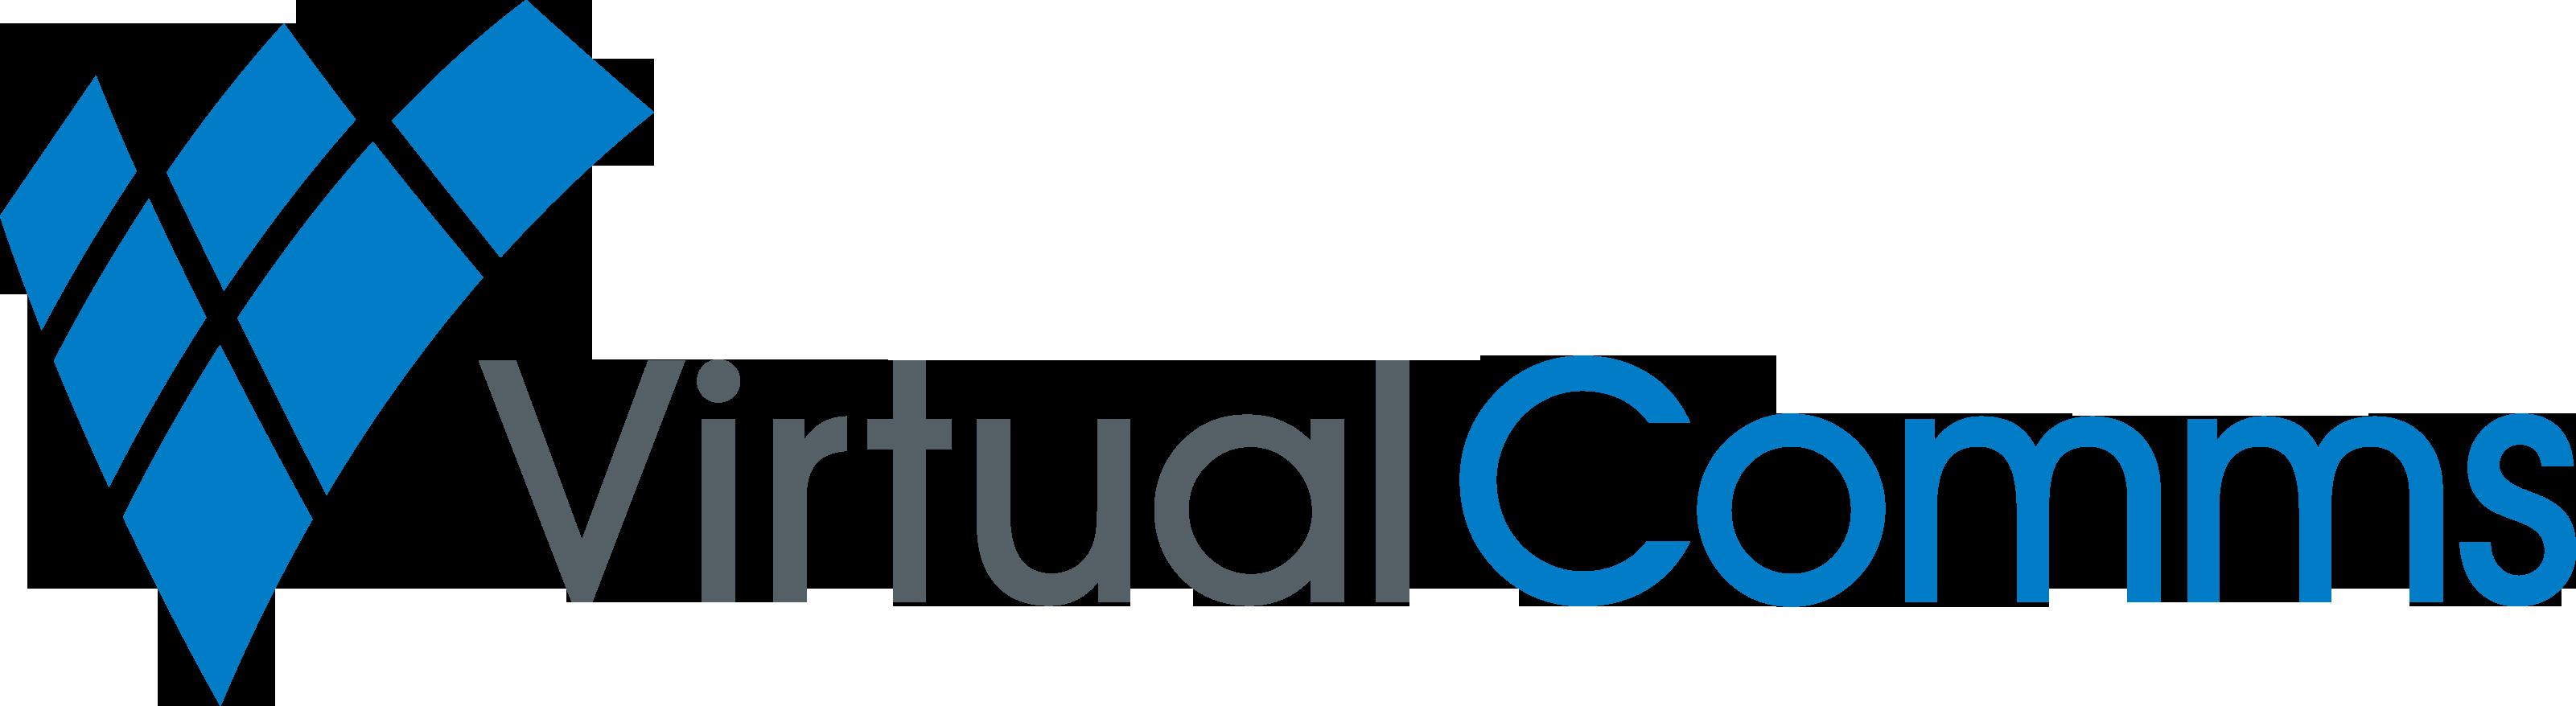 Virtual Comms